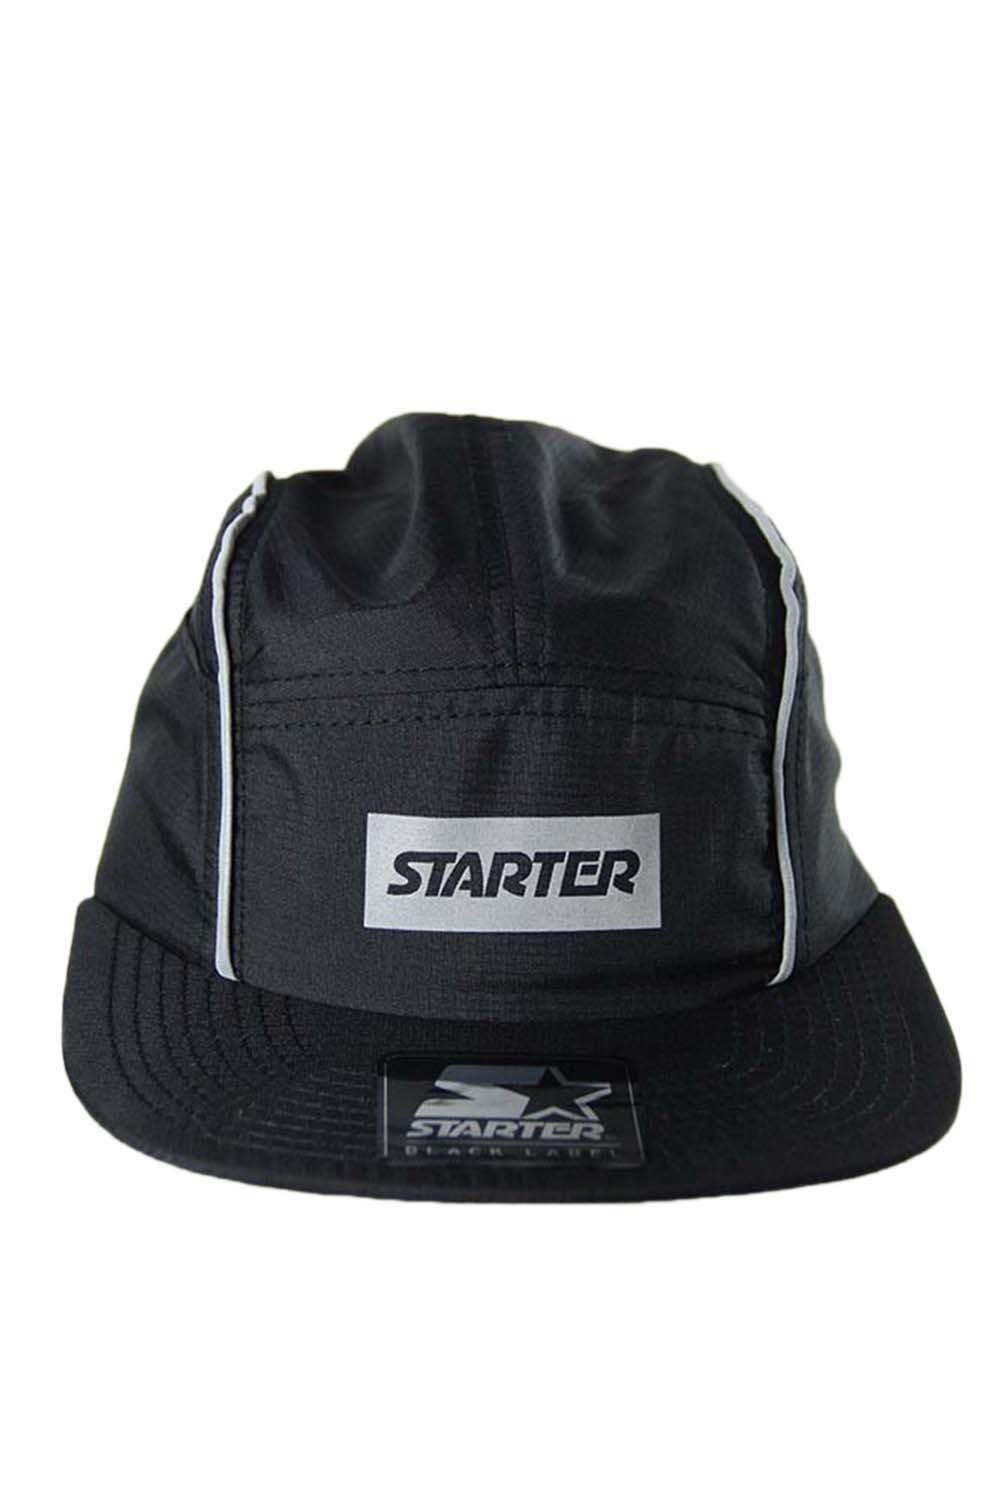 BONE STARTER S722A - PTO